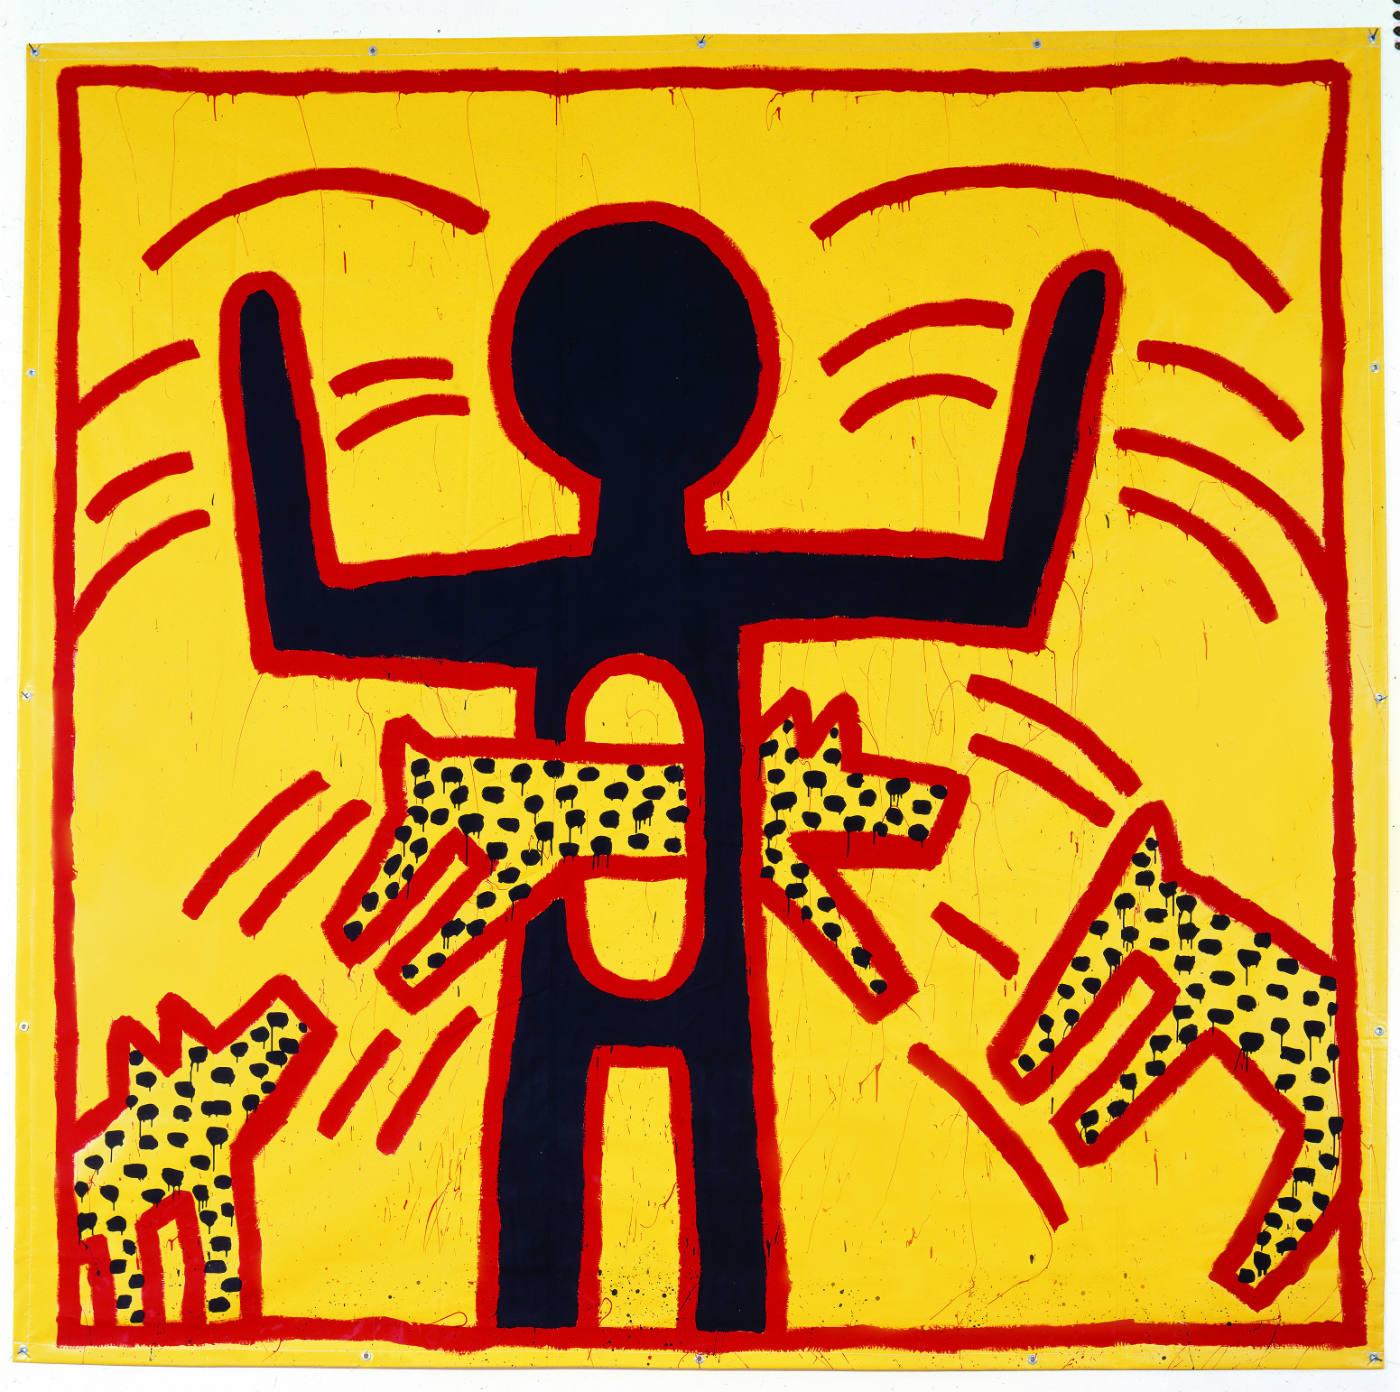 Keith Haring, zonder titel, vinylverf op vinyltarp 1982 (c) Keith Haring Foundation